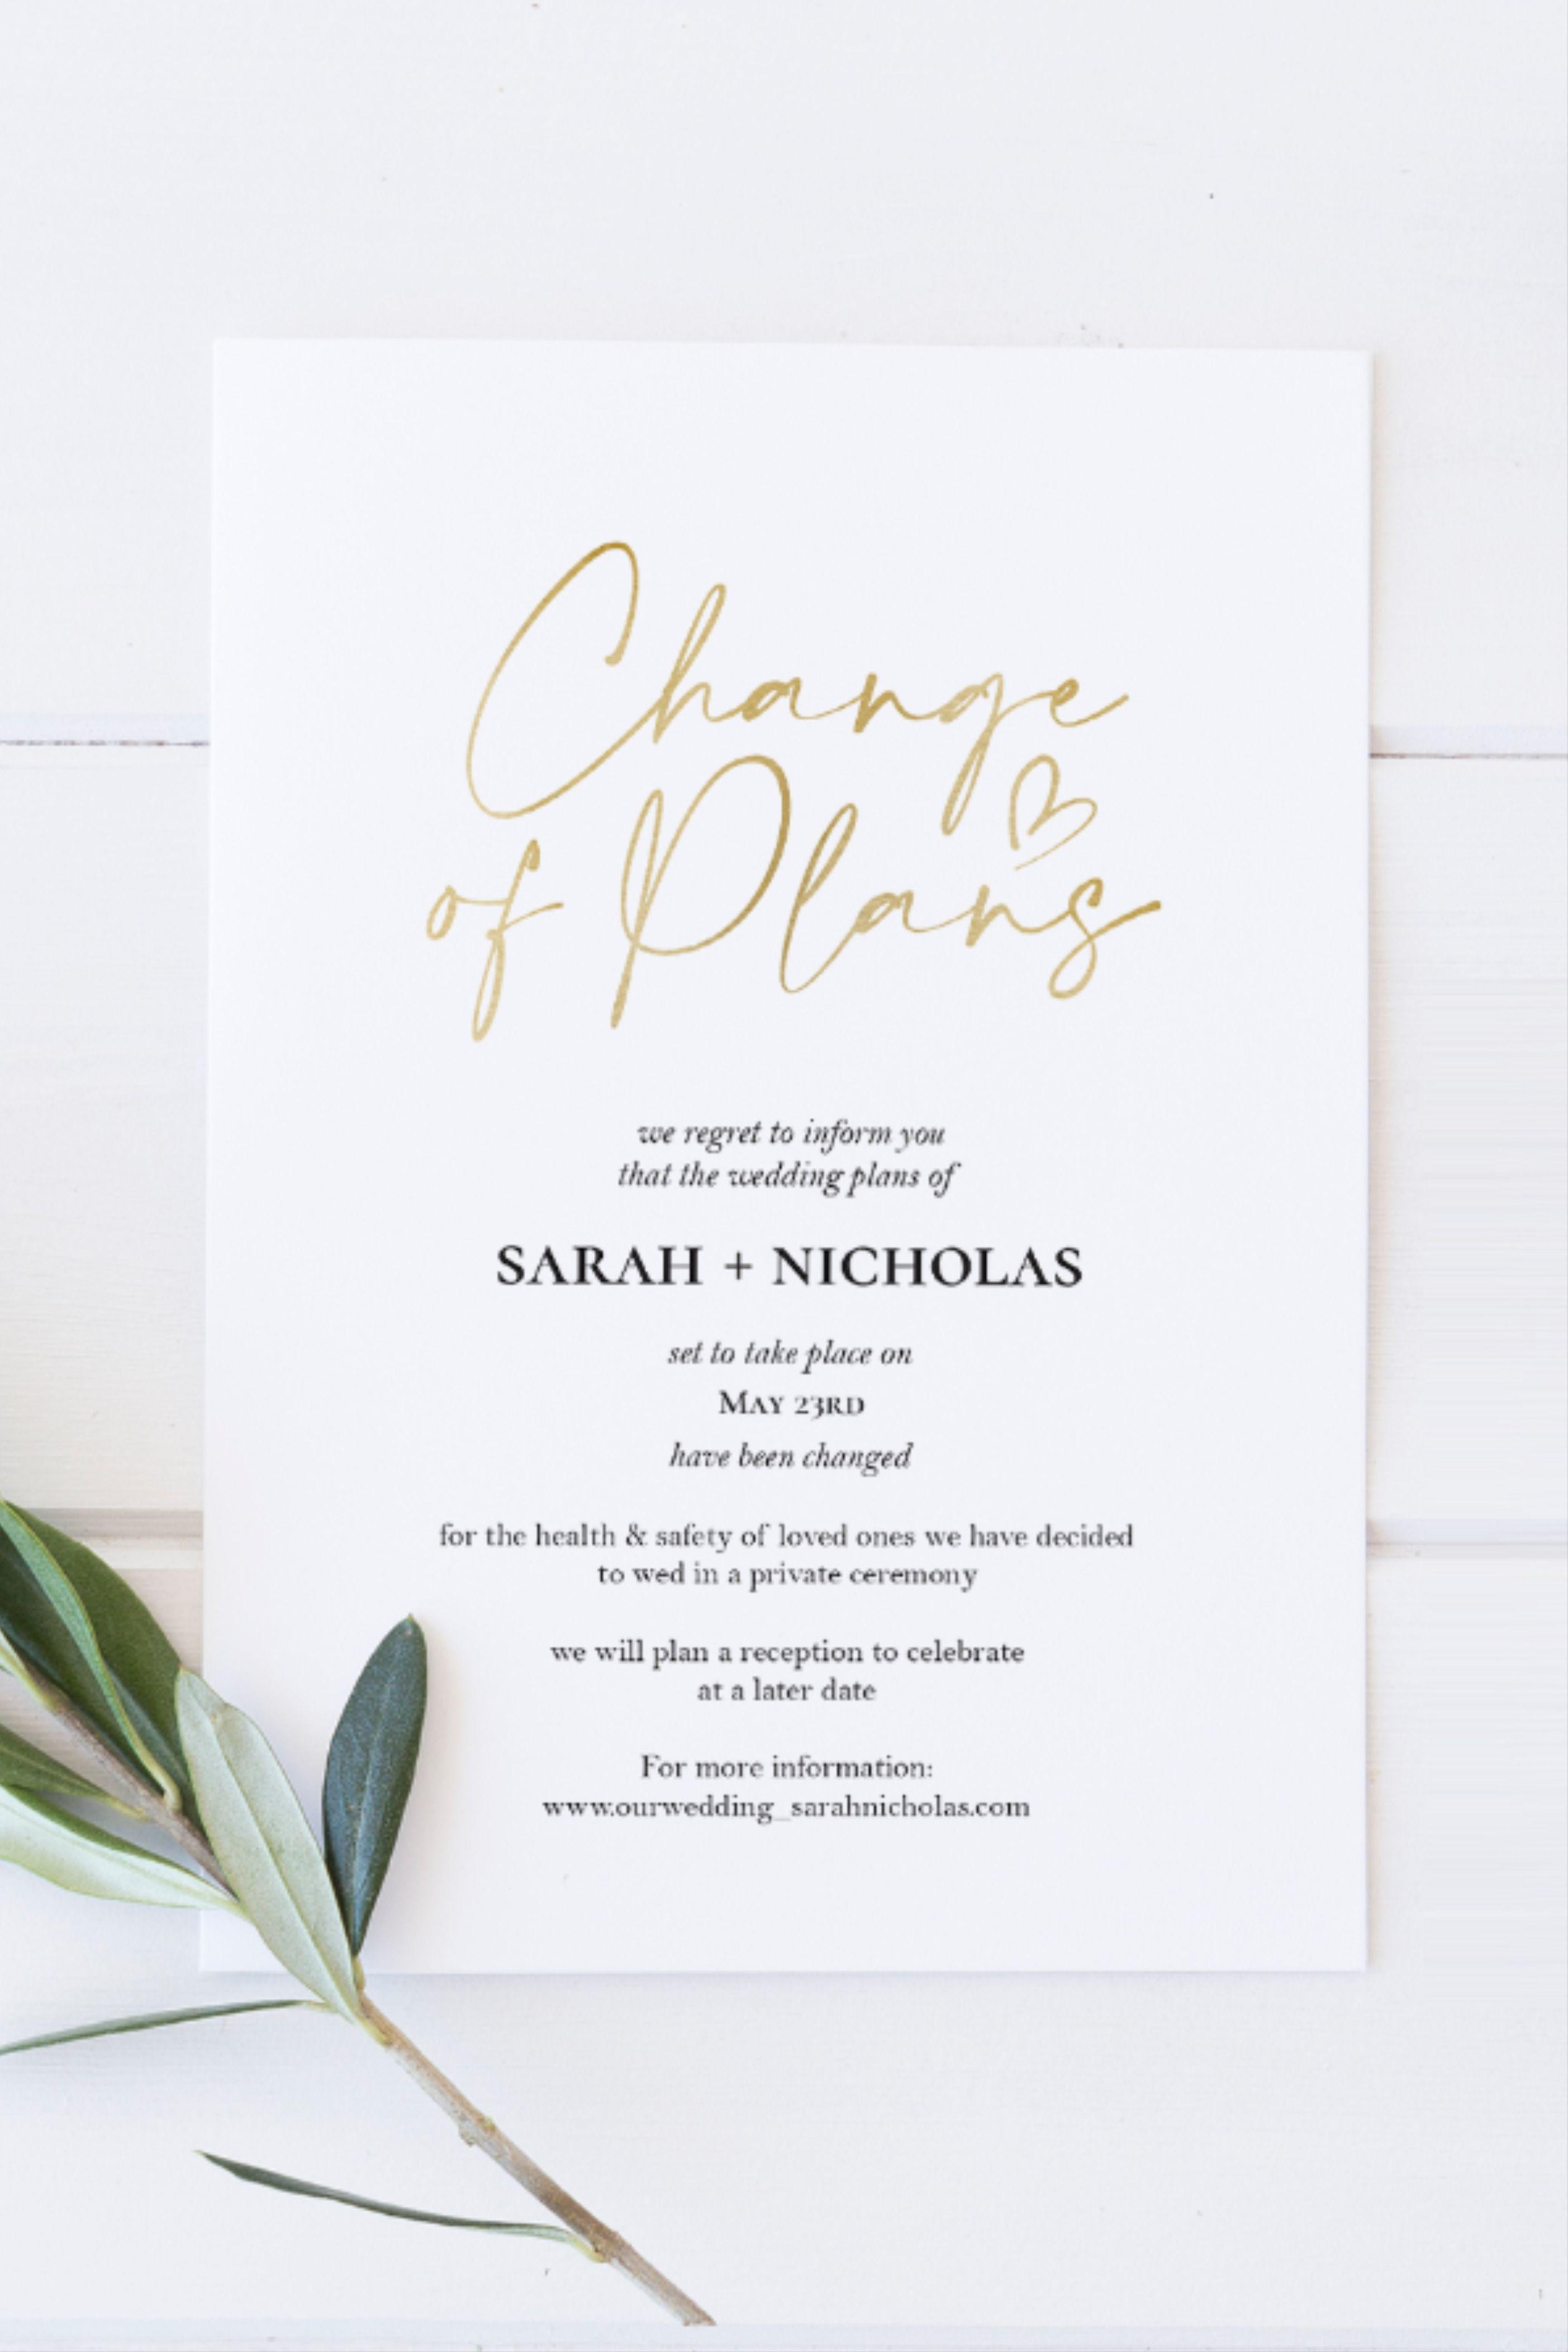 Wedding Postponement Text Message Instant Wedding Reschedule Announcement ANTOINETTE Change of Plans Invitation Template Hand-drawn